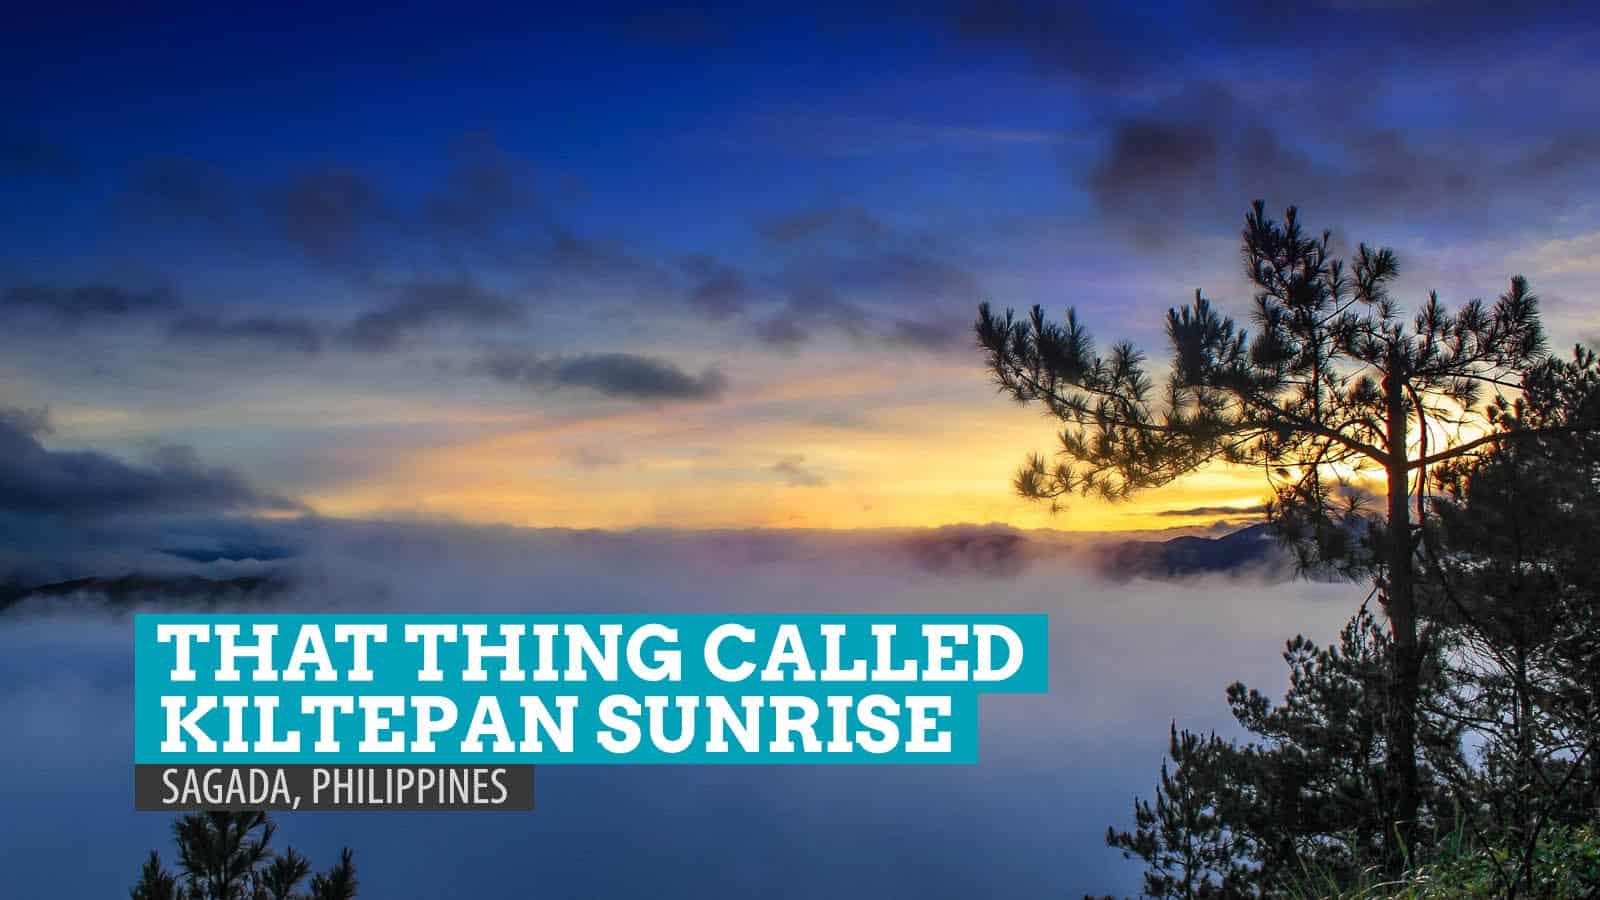 That Thing Called Kiltepan Sunrise: Sagada, Philippines